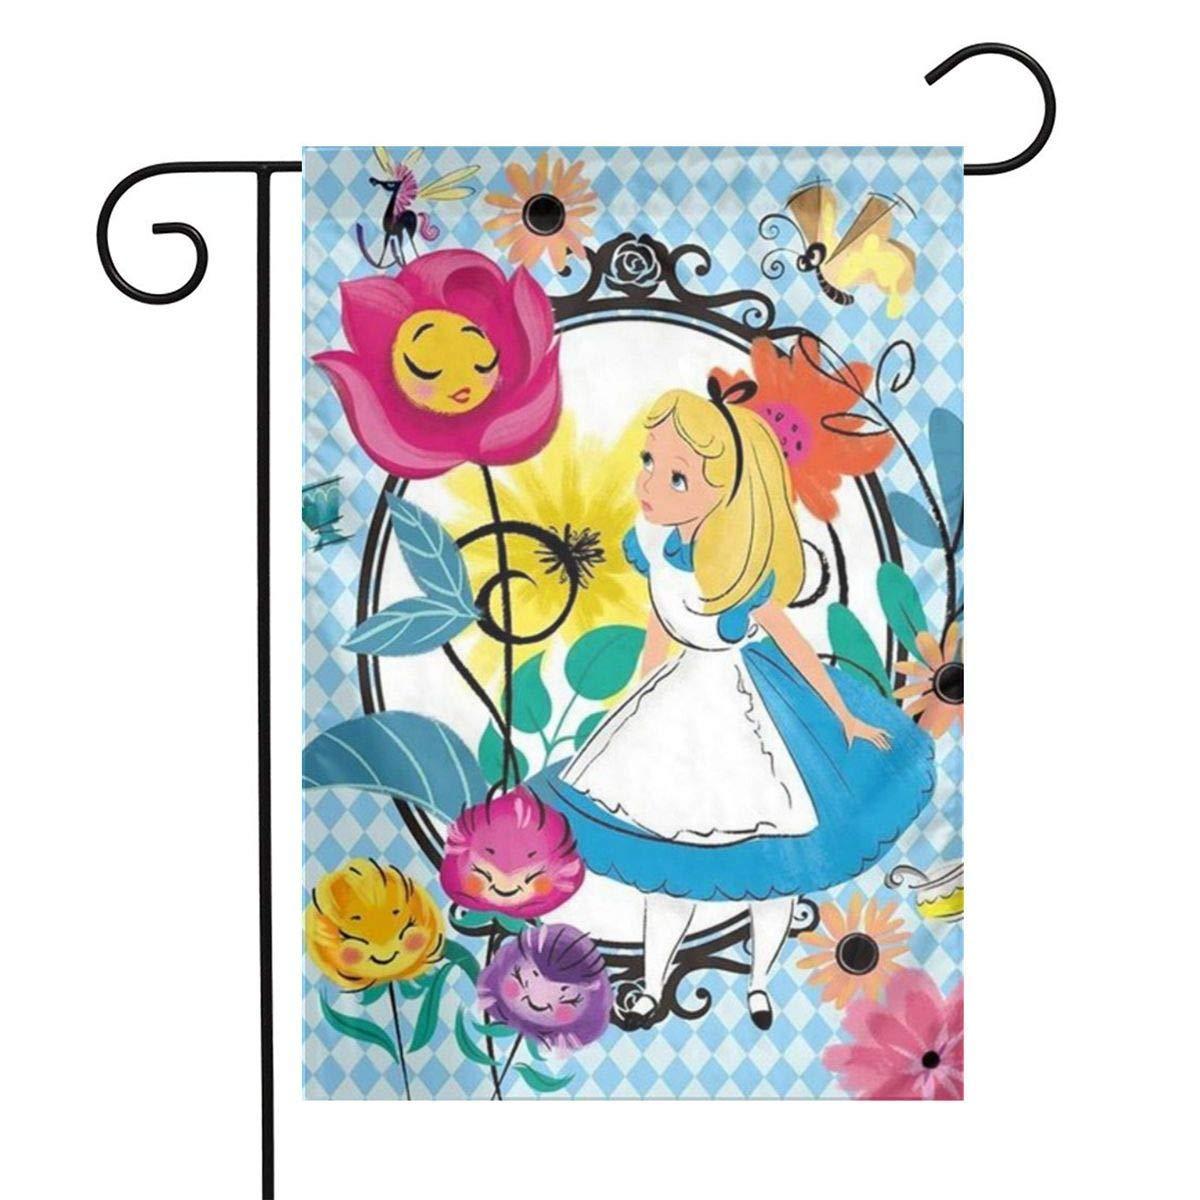 QIEARA Alice in Wonderland Garden Flag Home Outdoor/Indoor Yard Flag 12 X 18 Inch